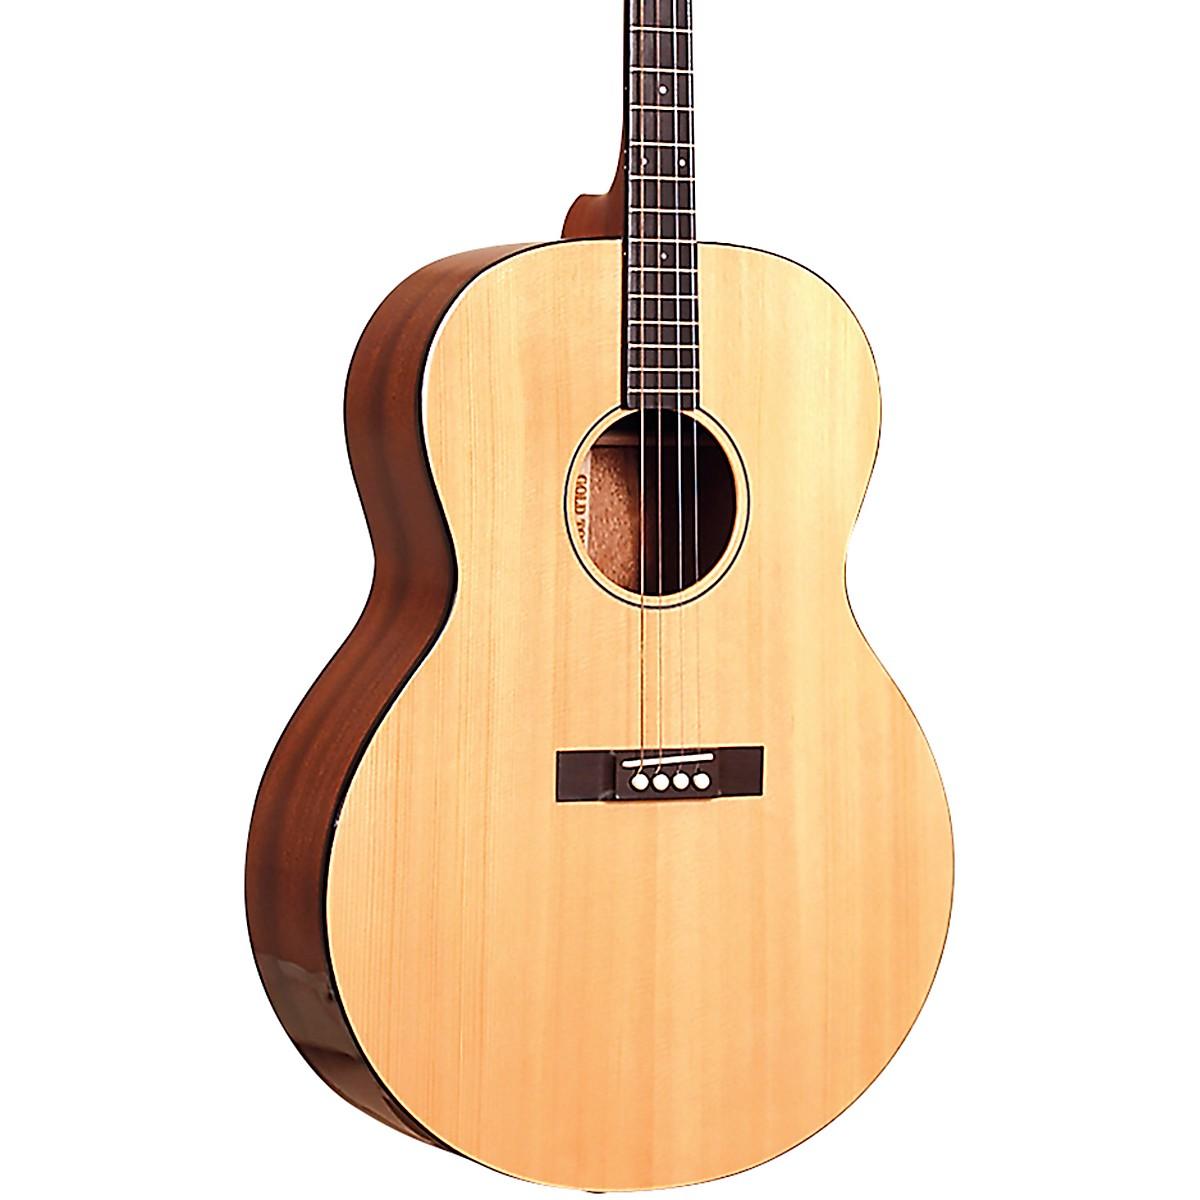 Gold Tone TG-18 Left-Handed Tenor Guitar with Vintage Design